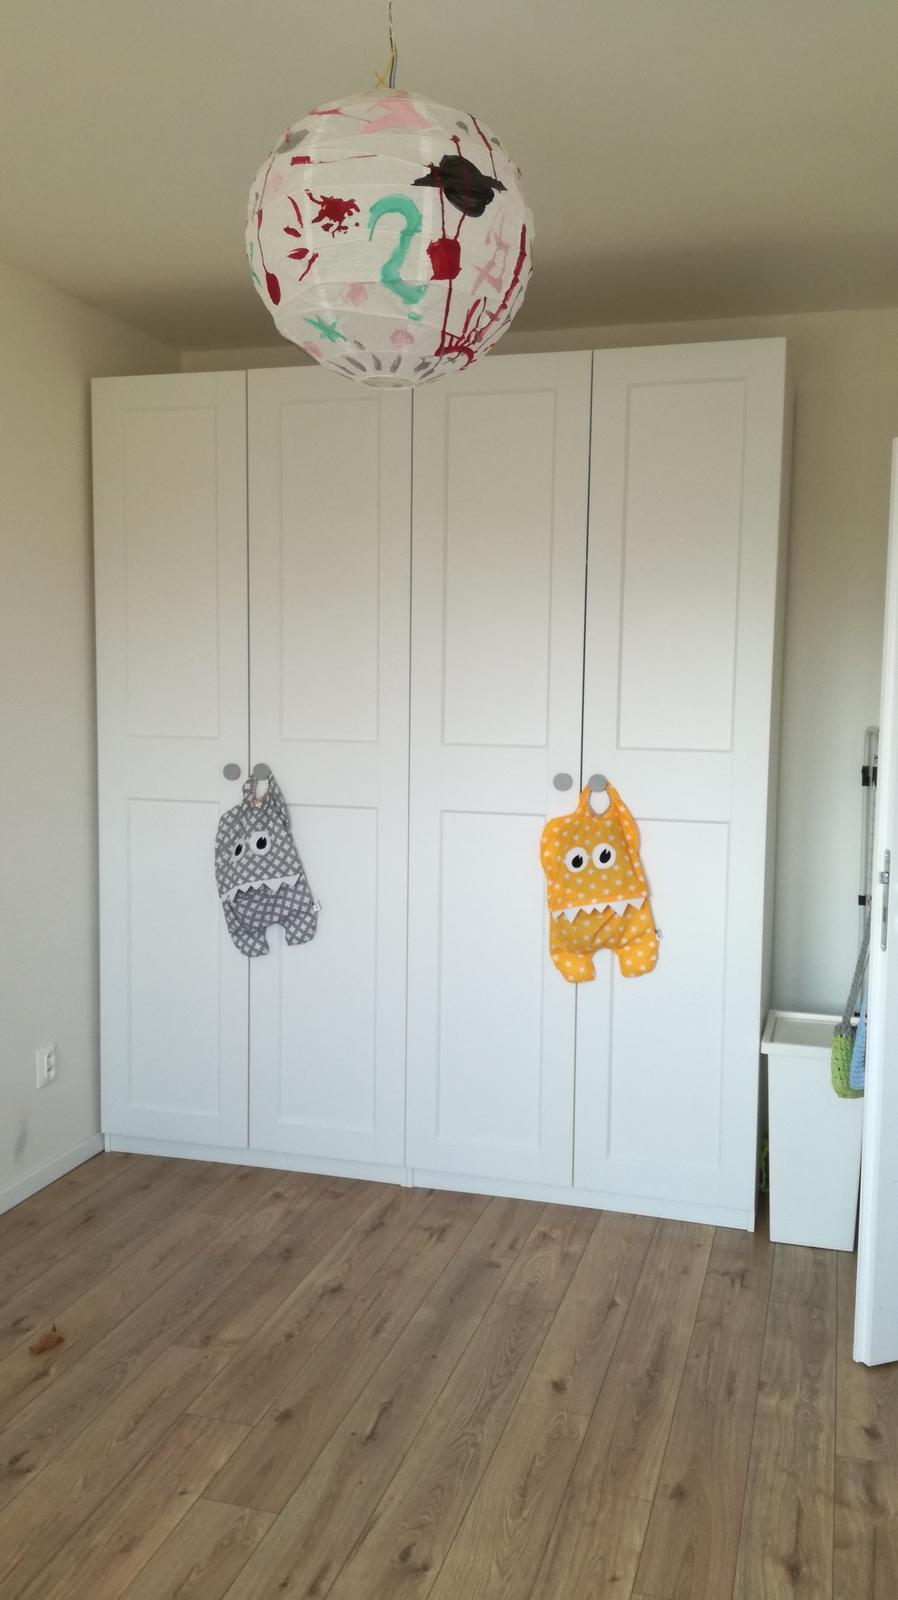 Minidomček pod Karpatmi - dve Pax skrine v detskej izbe , plastovy kos na pradlo uz zmizol chvalabohu. lampu malovala starsia :)